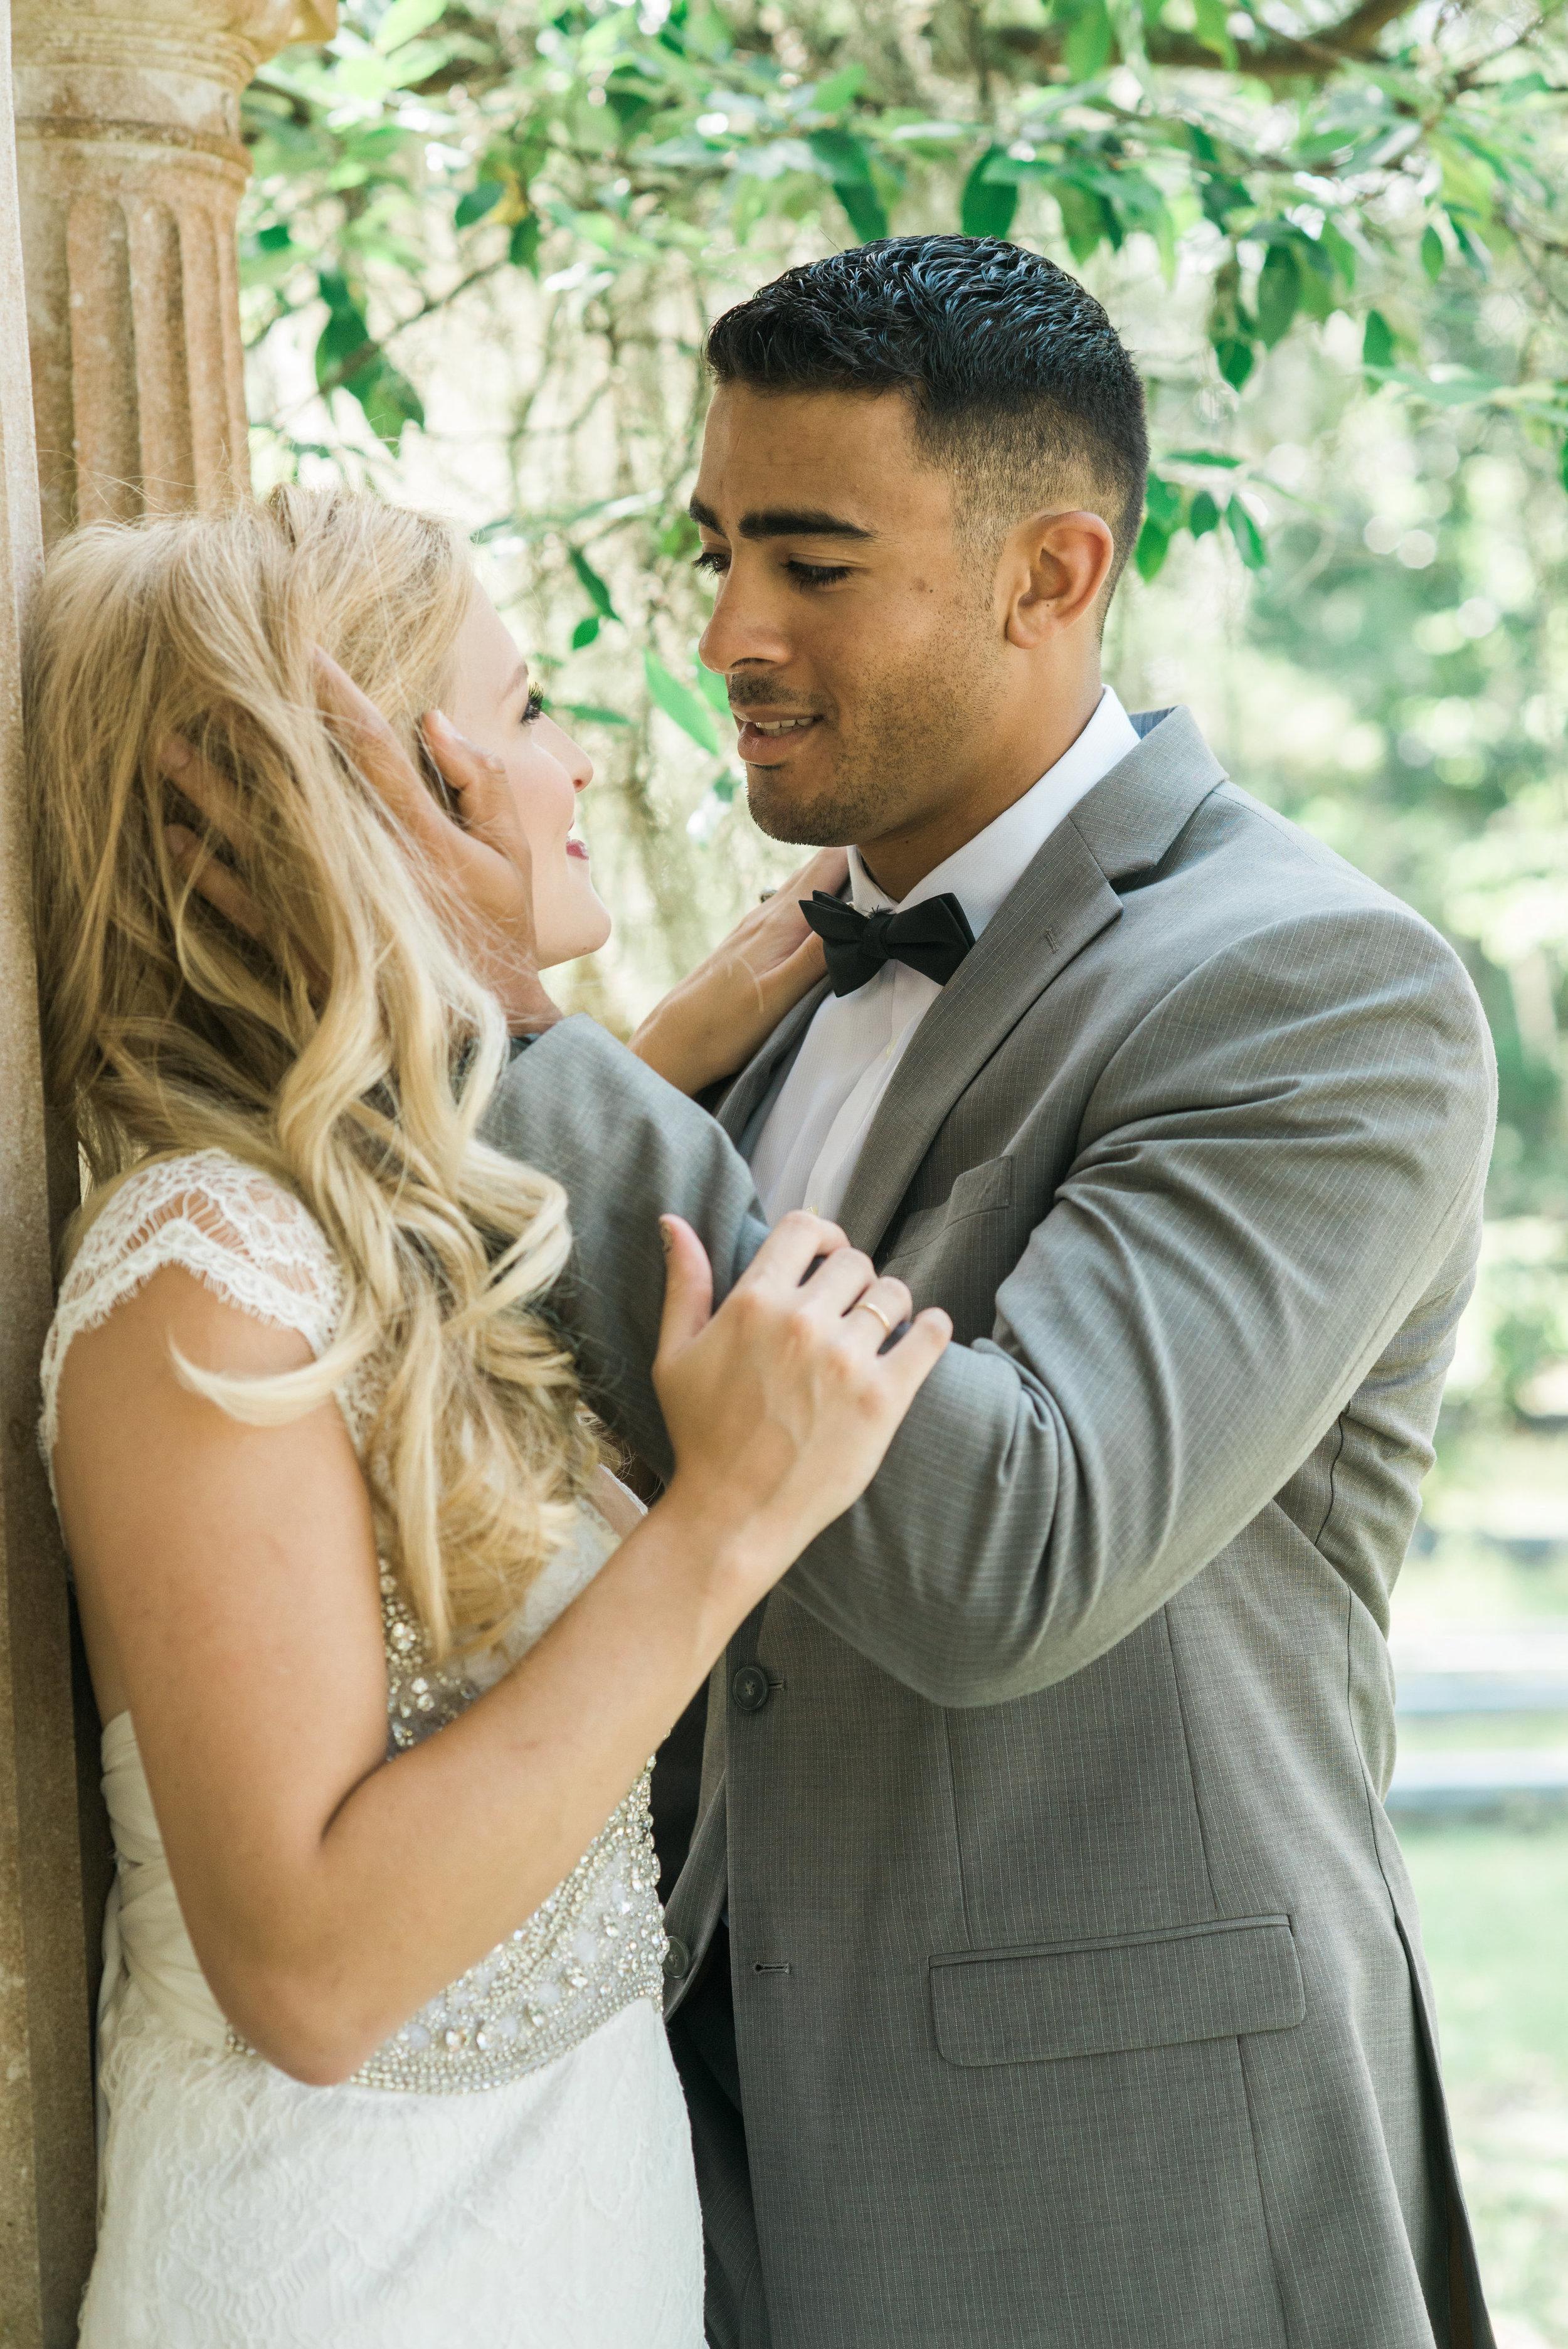 callie-beale-photography-Bonaventure-cemetery-michelle-royal-makeup-cemetery-wedding-ivory-and-beau-wedding-planning-anna-campbell-harper-savannah-bridal-boutique-savannah-wedding-dresses-savannah-weddings-3.jpg